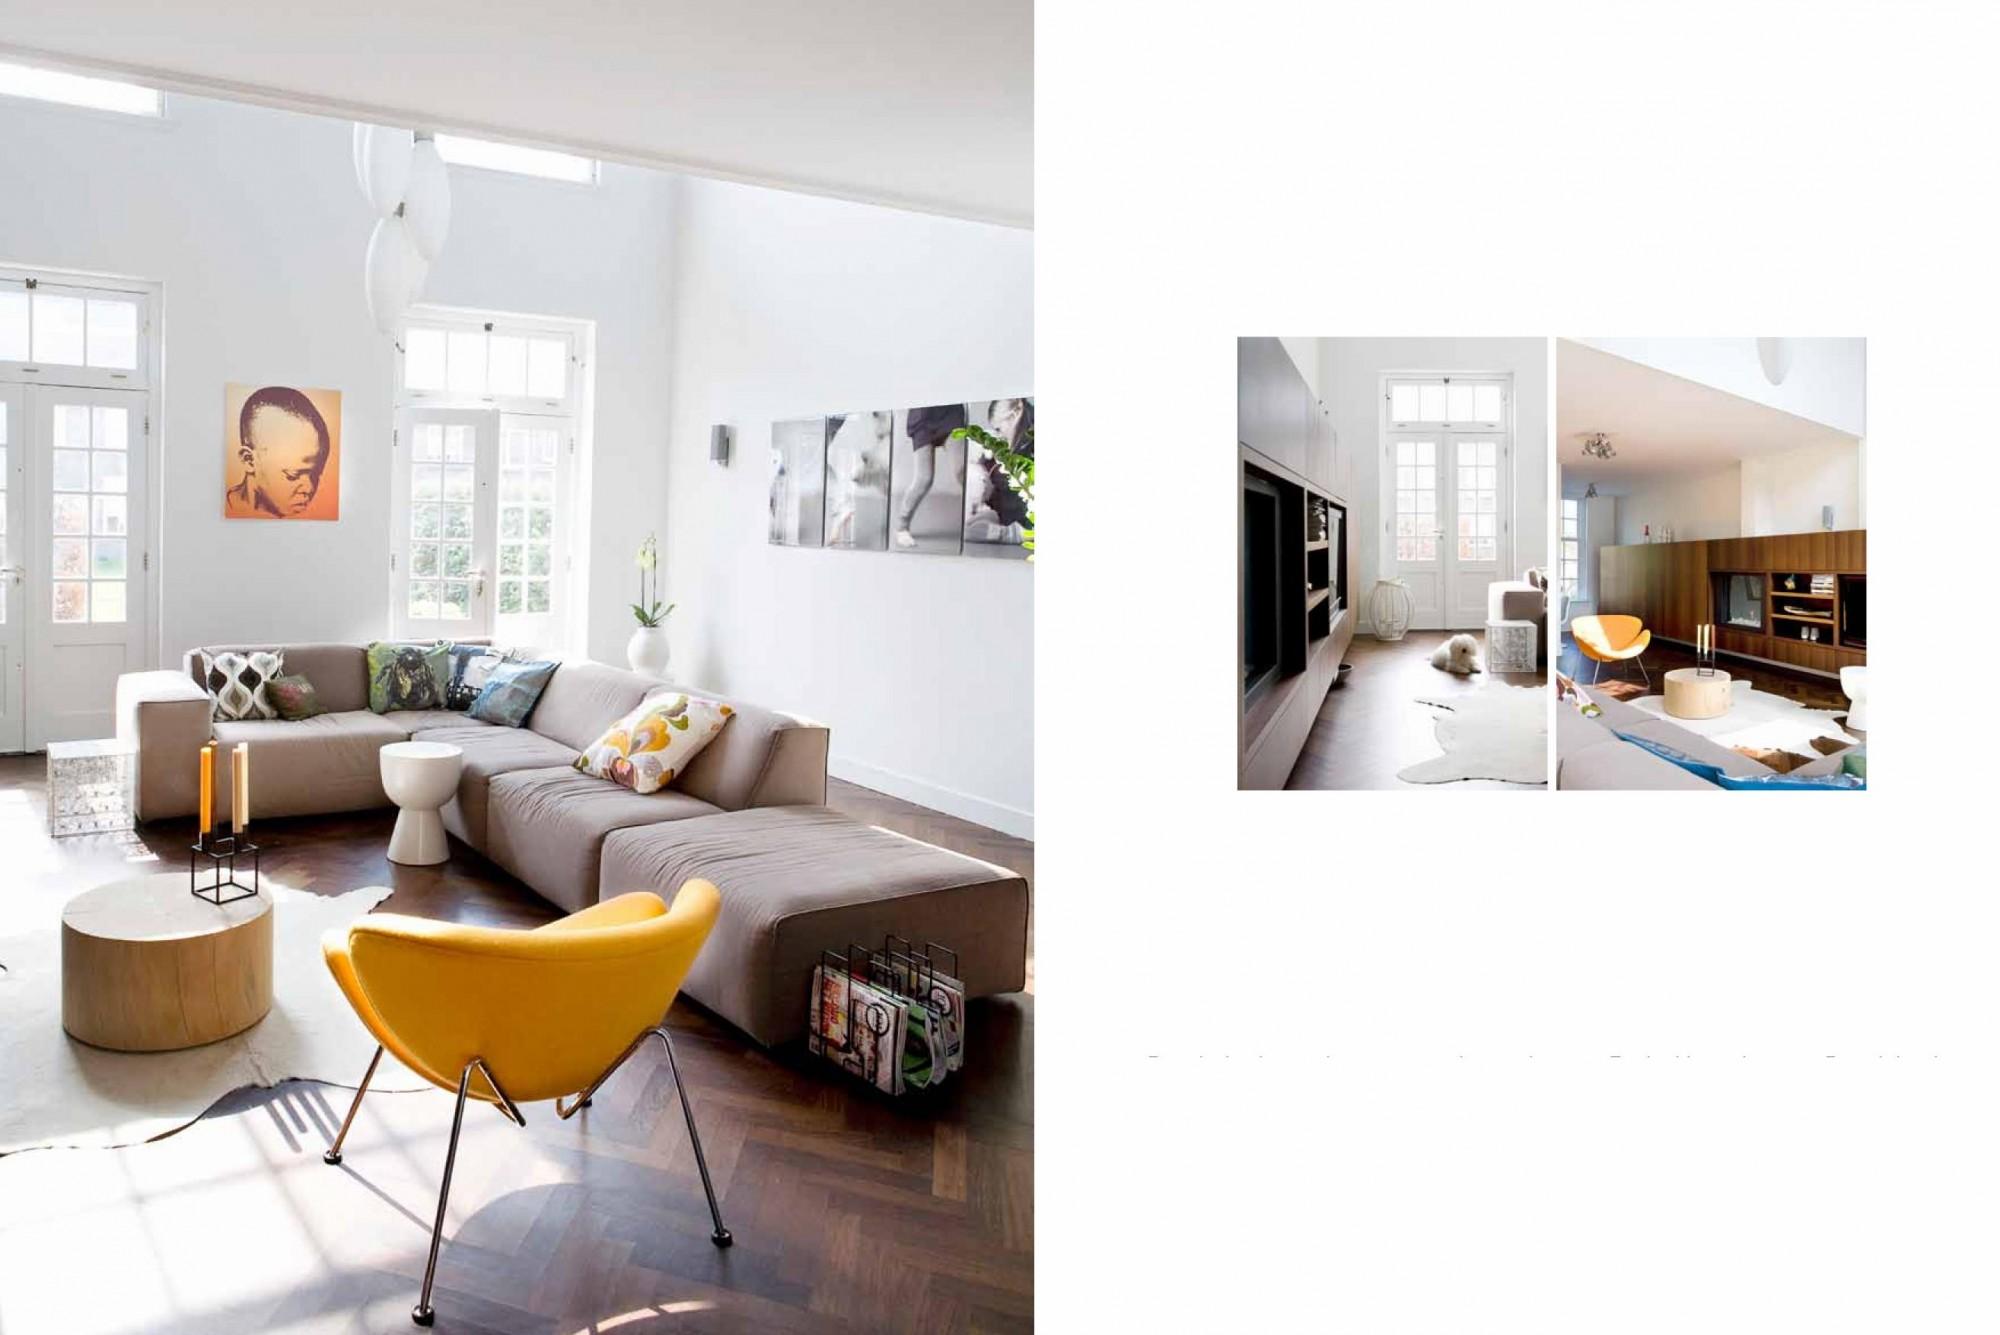 Modern Interieur Woonkamer : Inrichting woonkamer landelijk awesome landelijke inrichting tips